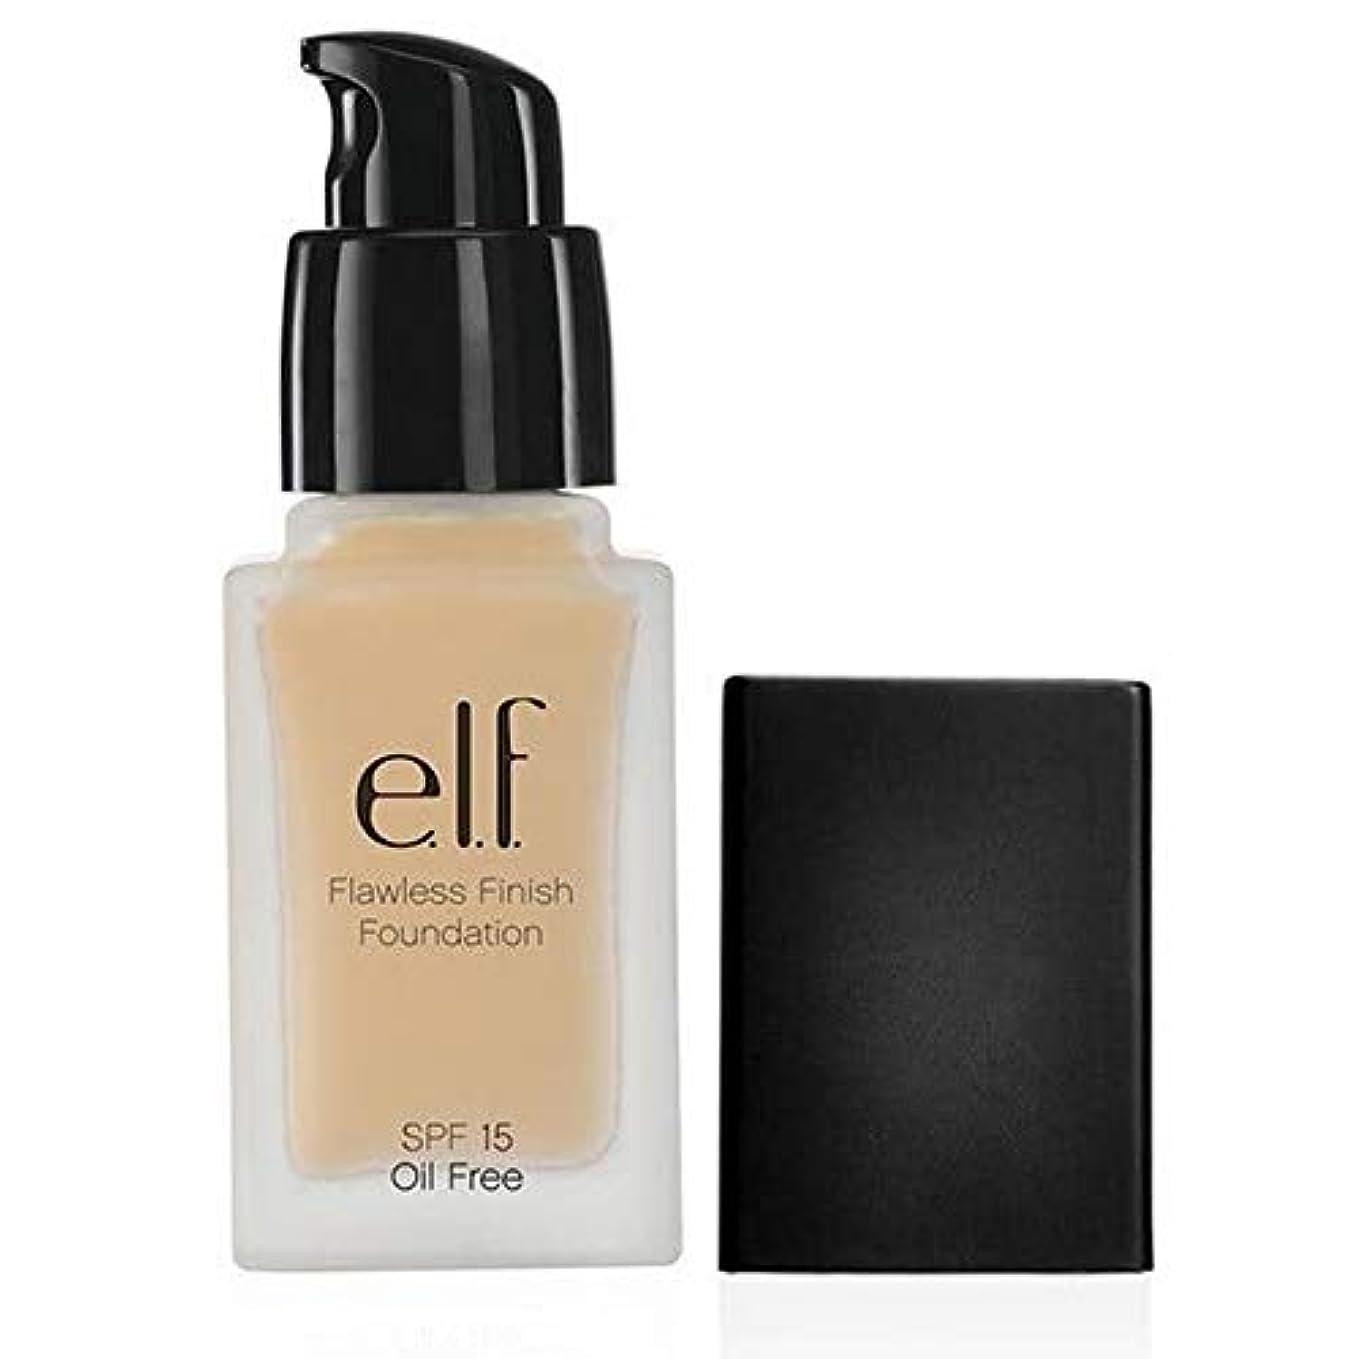 [Elf ] エルフ。完璧な仕上がりの基礎Spf15磁器111 - e.l.f. Flawless Finish Foundation SPF15 Porcelain 111 [並行輸入品]